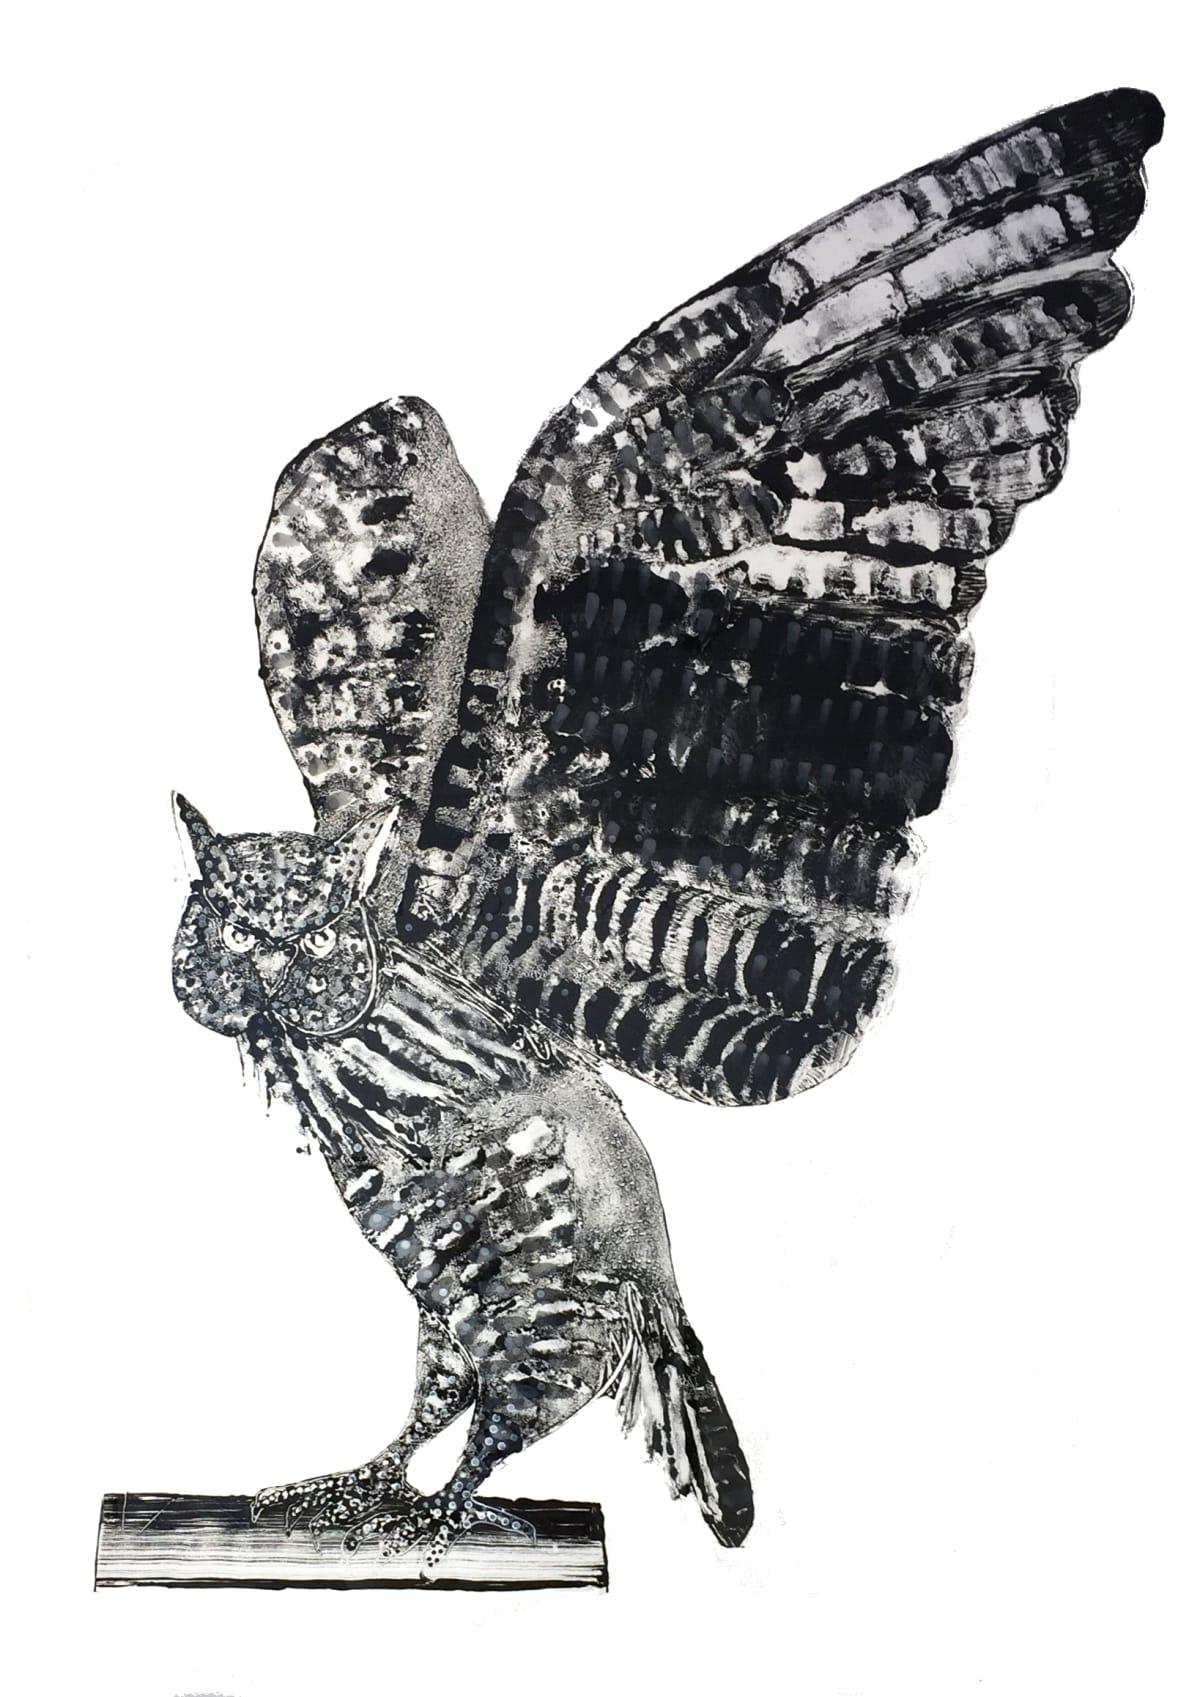 Stuart MacKenzie RSA Eagle Owl II Oil on paper 106 x 84 cm